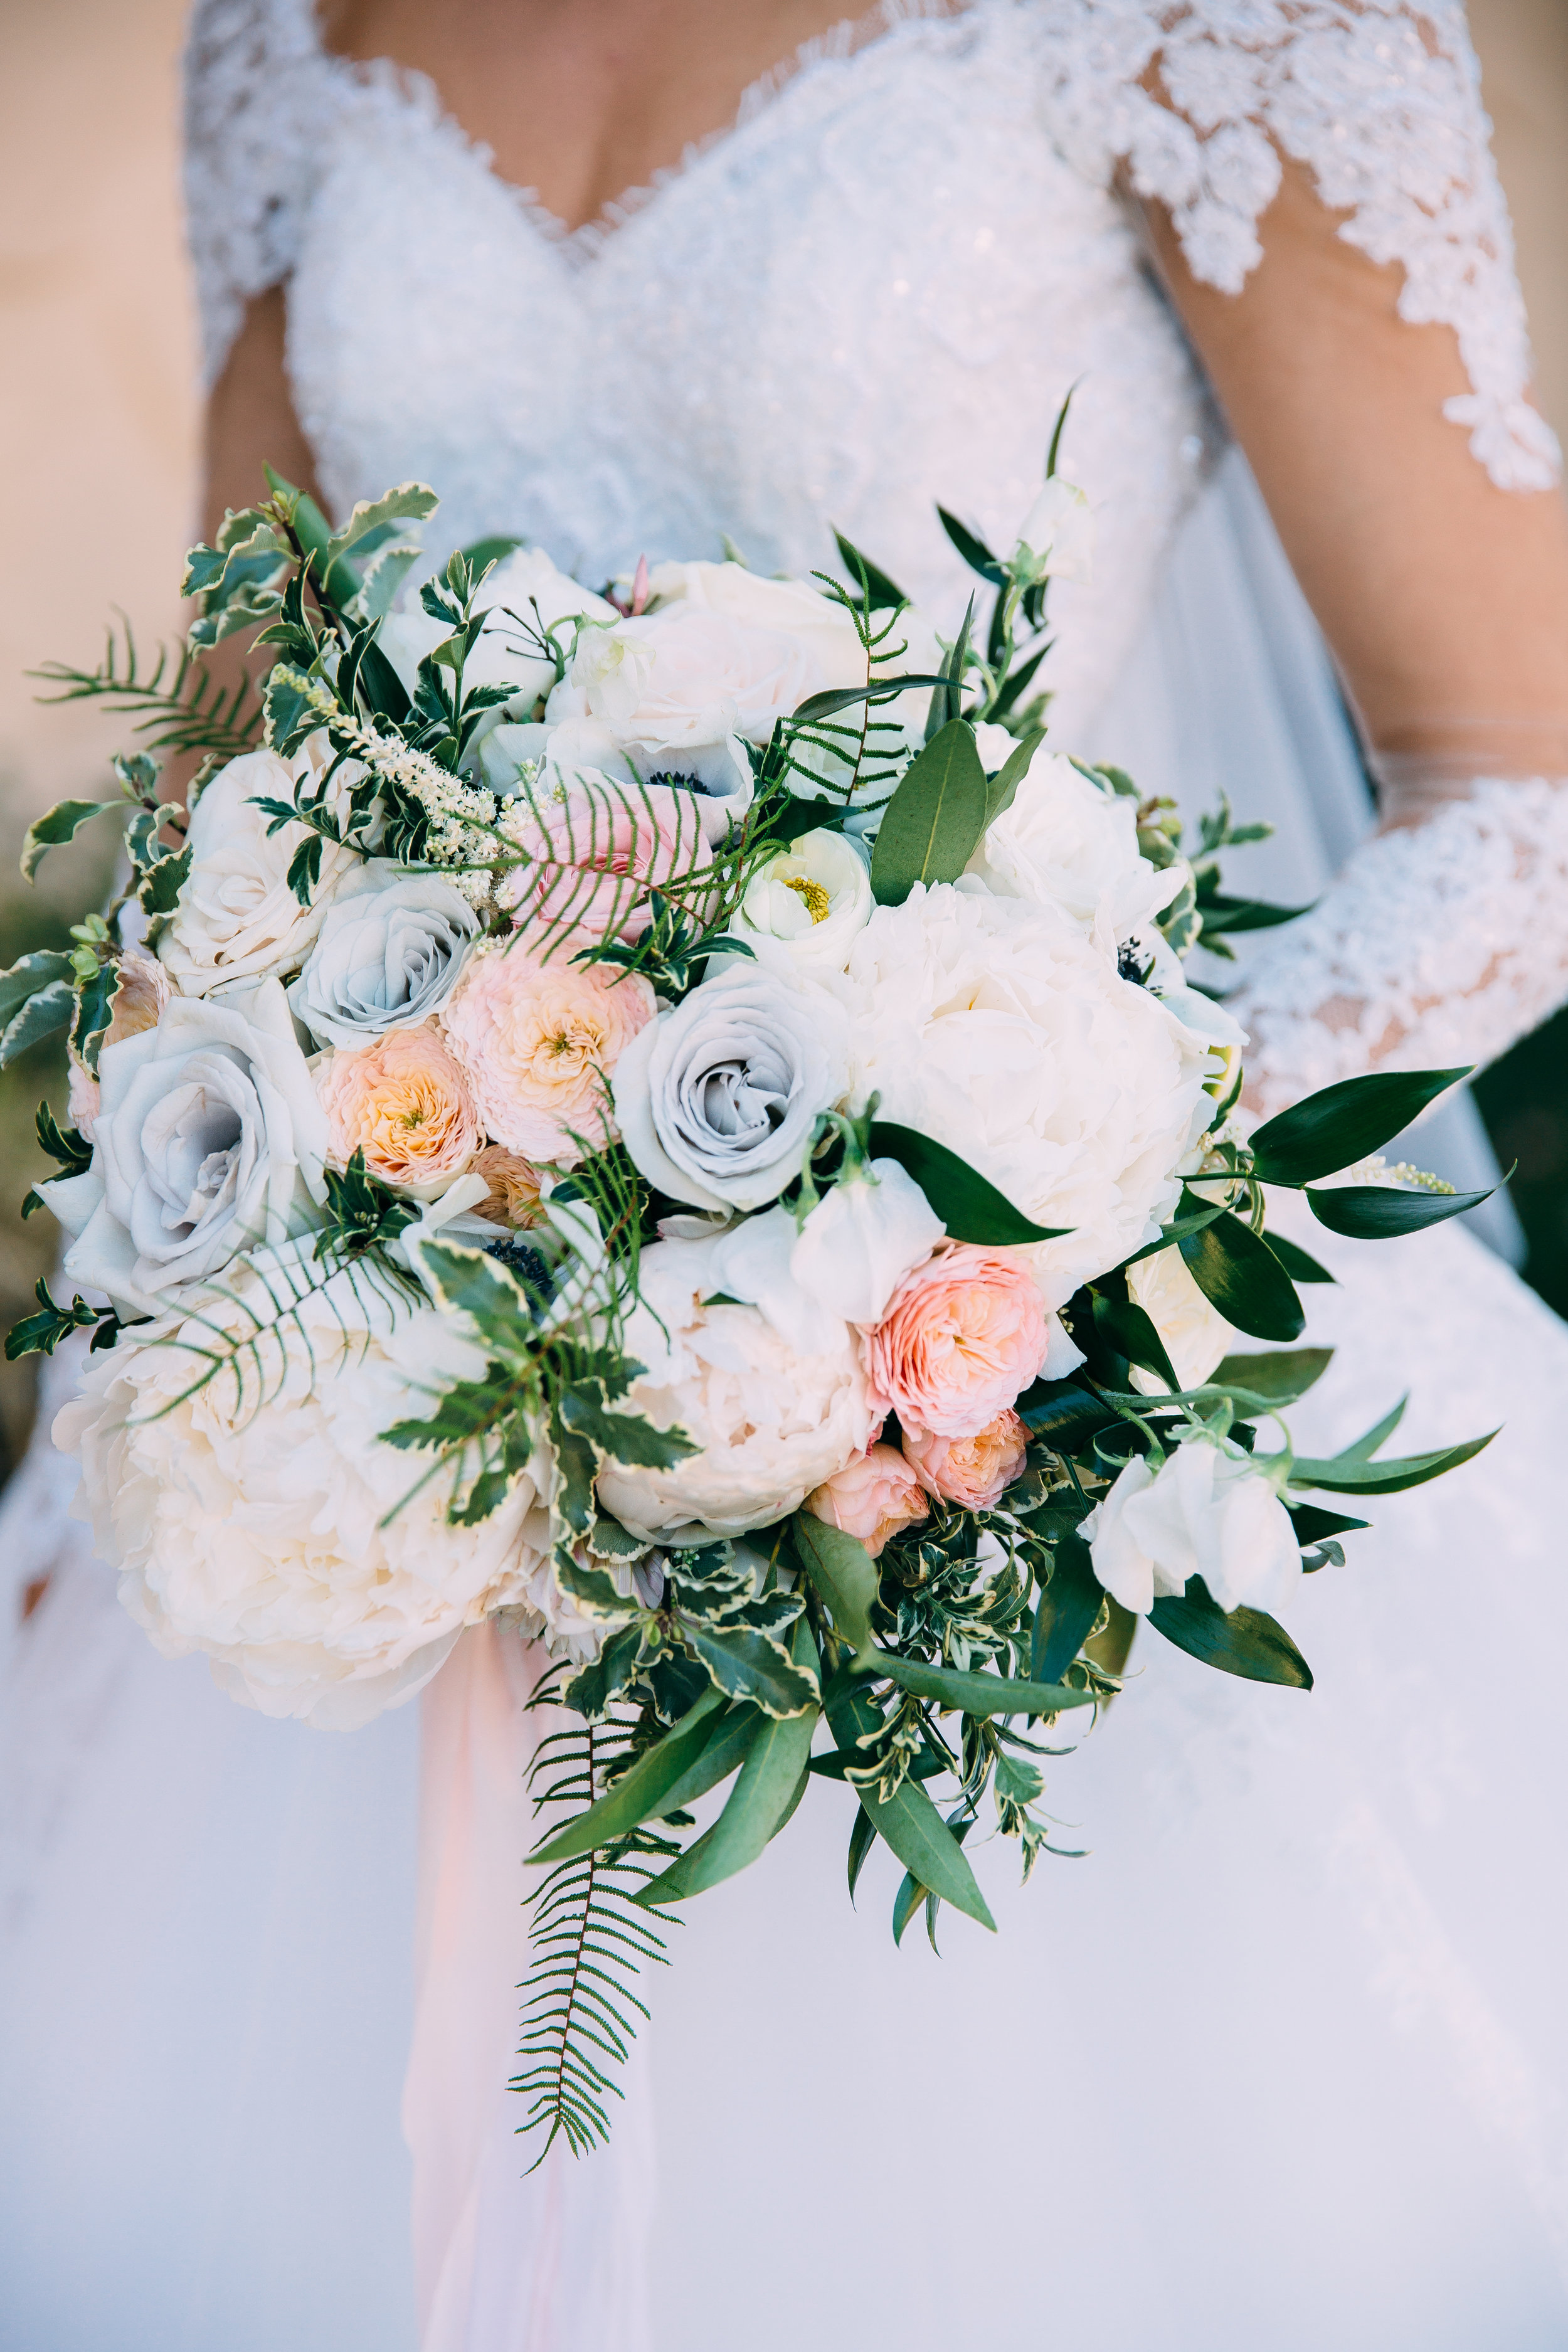 Violette-fleurs-anna-perevertaylo-White-Blush-elegant-flowers-for-wedding-decor-upscale-design-roseville-sacramento-california-rancho-robles-vinyards-lincoln-elegant-luxury-blush-whimsical-bridal-bouquet-beautiful-dress.jpg